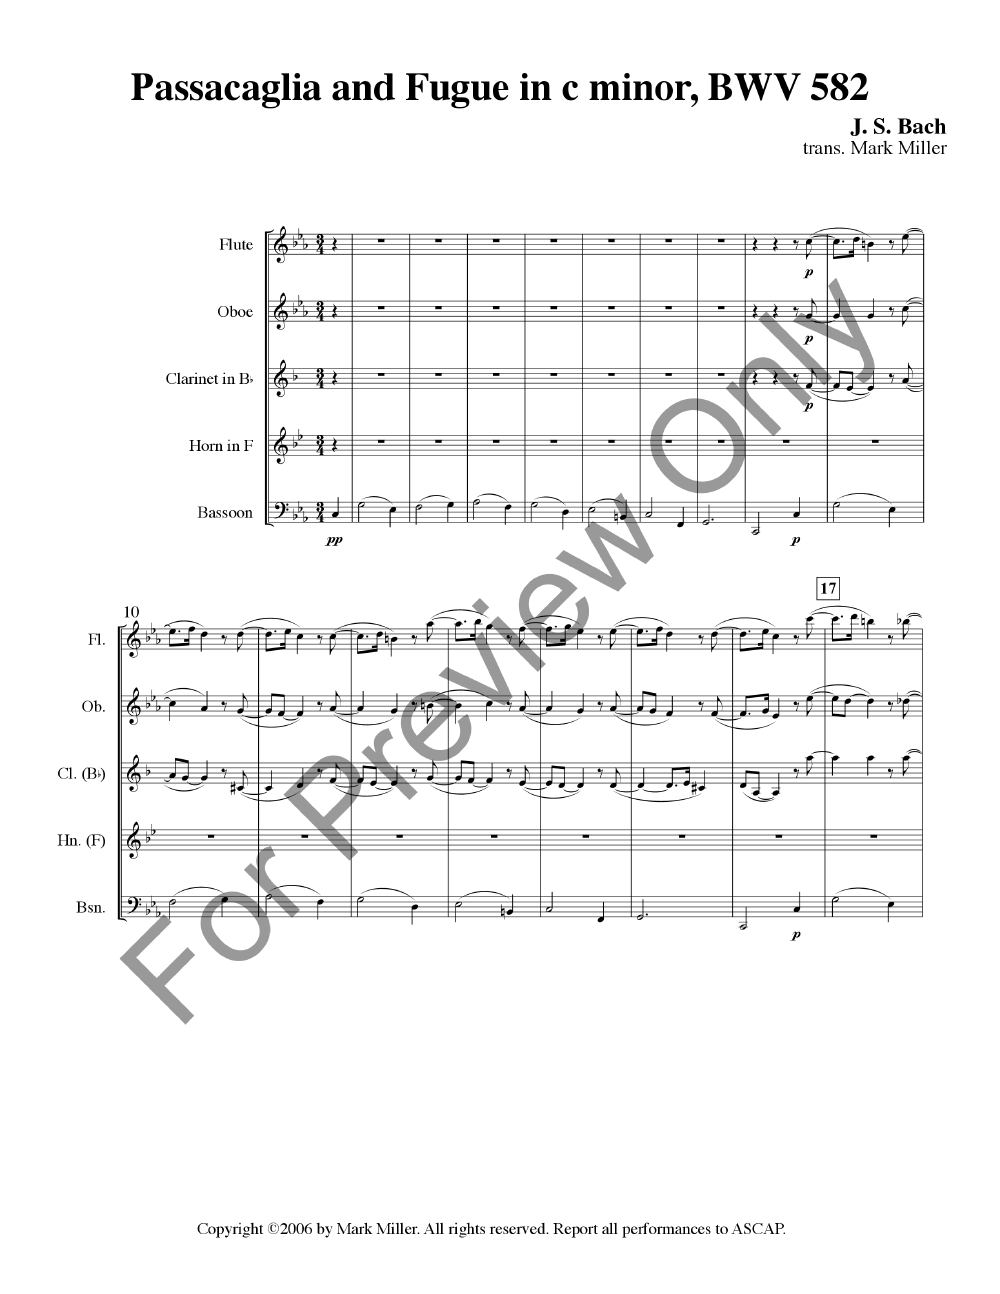 Passacaglia and Fugue in c minor BWV 582 Thumbnail